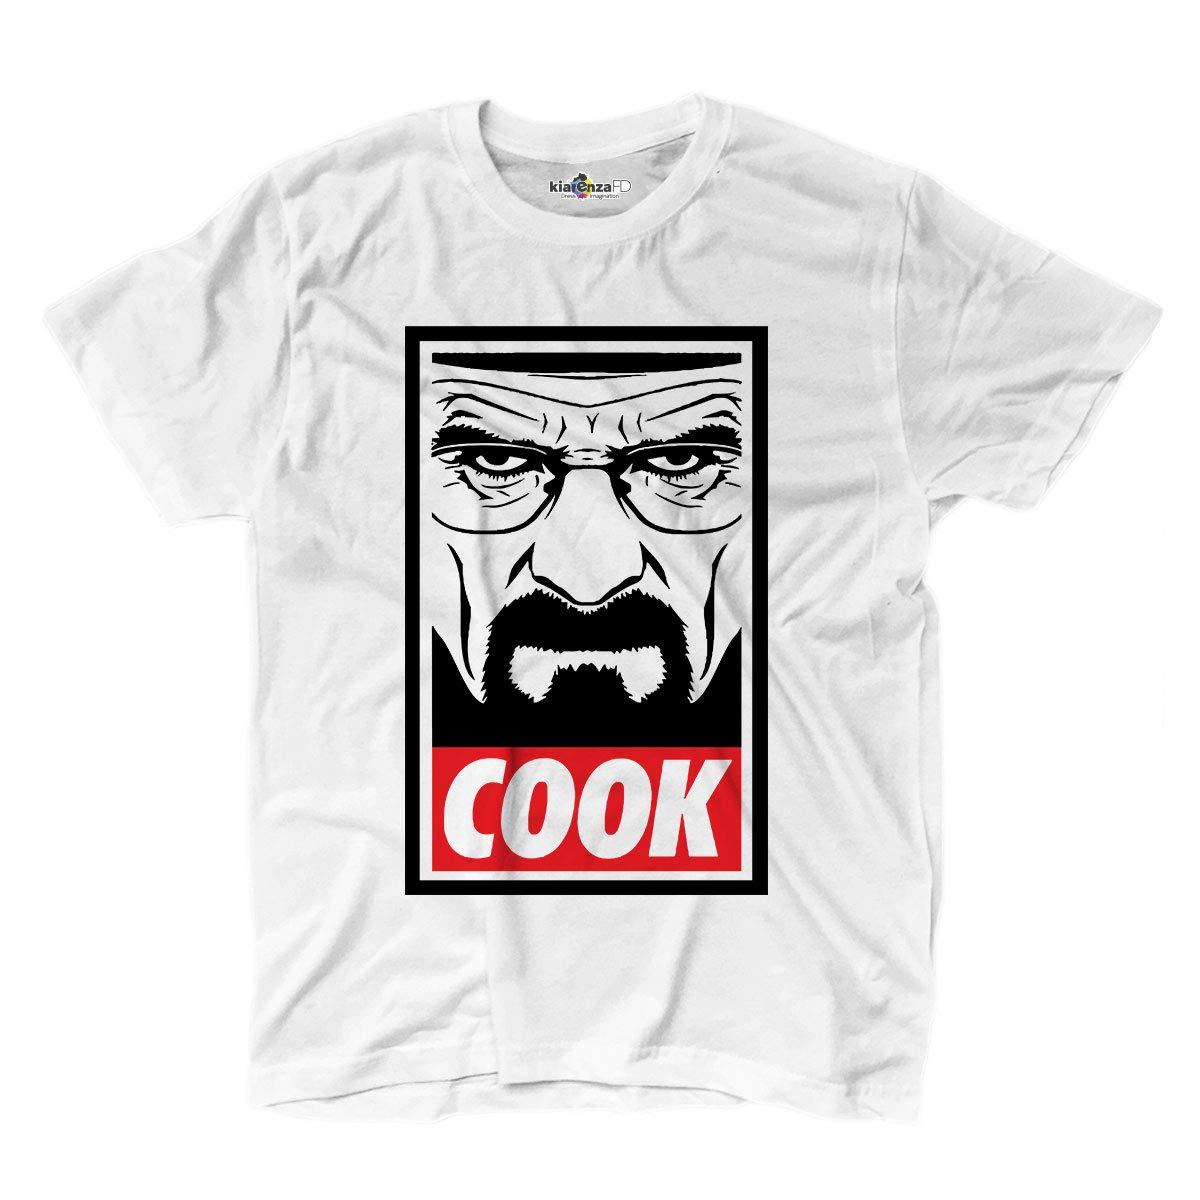 KiarenzaFD - Camiseta Camiseta Breaking Heisenberg Bad Crystal Meth Cook química, KTSA02282-S-white, Blanco, Small: Amazon.es: Deportes y aire libre